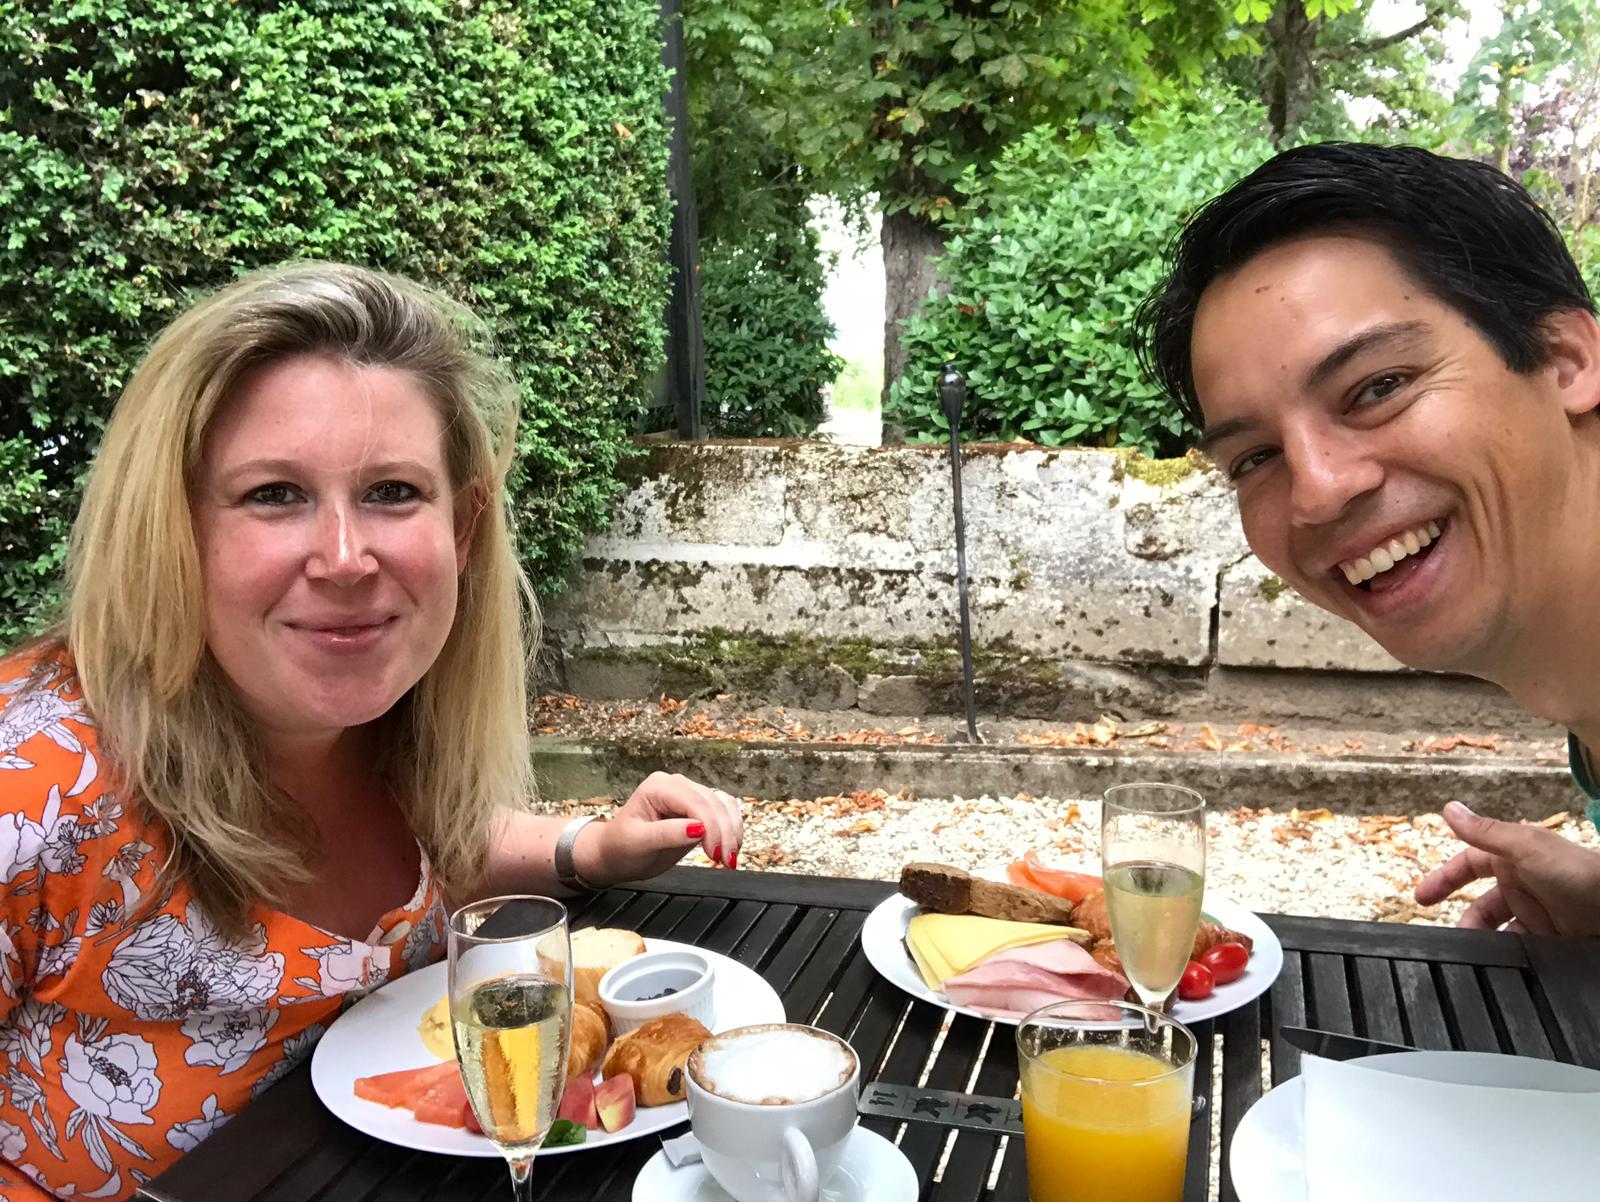 Culinair verblijf in de Dordogne bij Chateau Les Merles - Reistips van Foodblog Foodinista